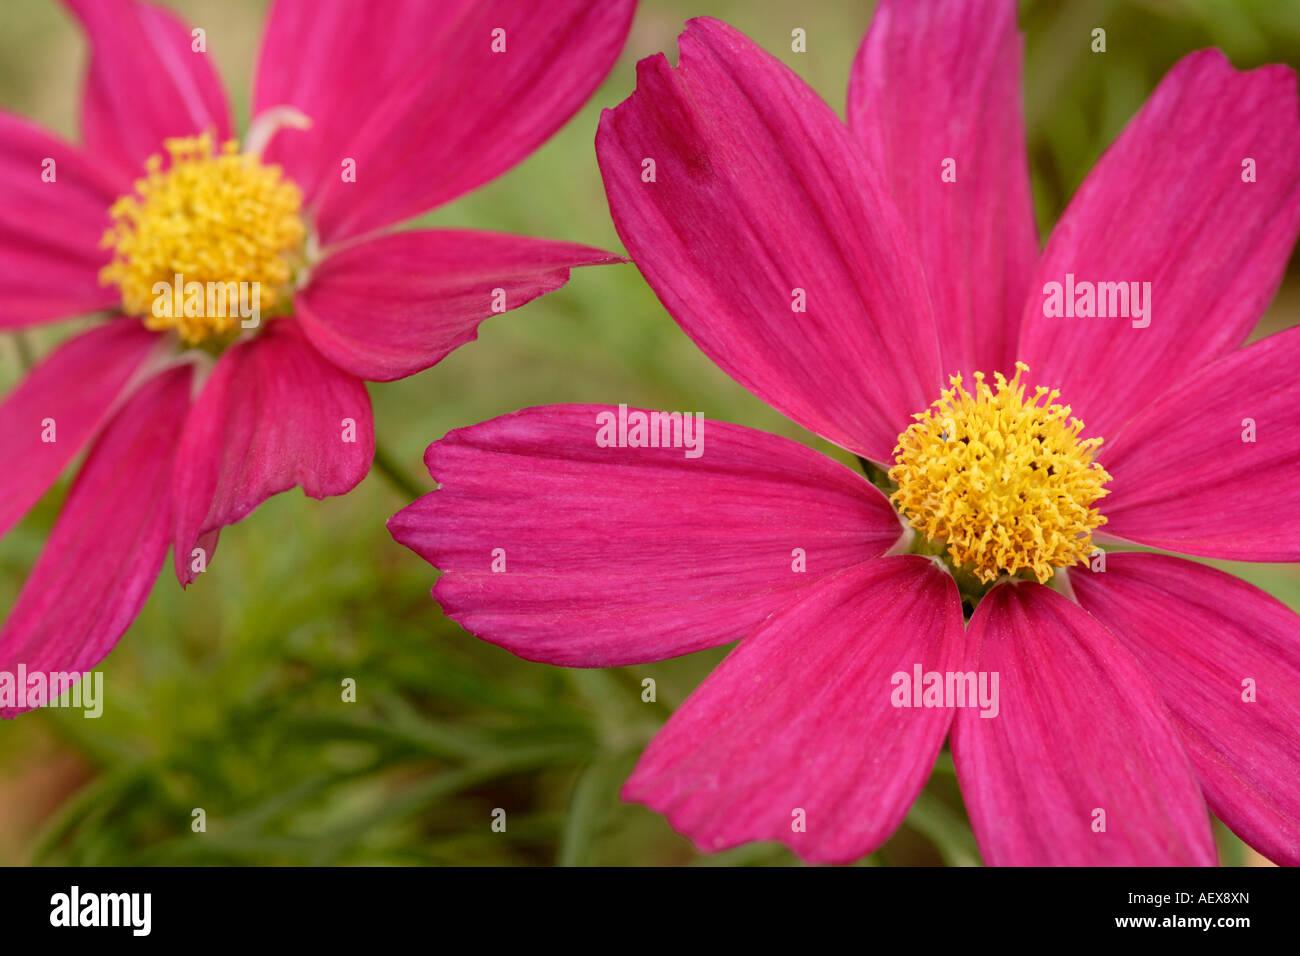 Cosmos bipinnatus 'sensation pink' flower close up - Stock Image